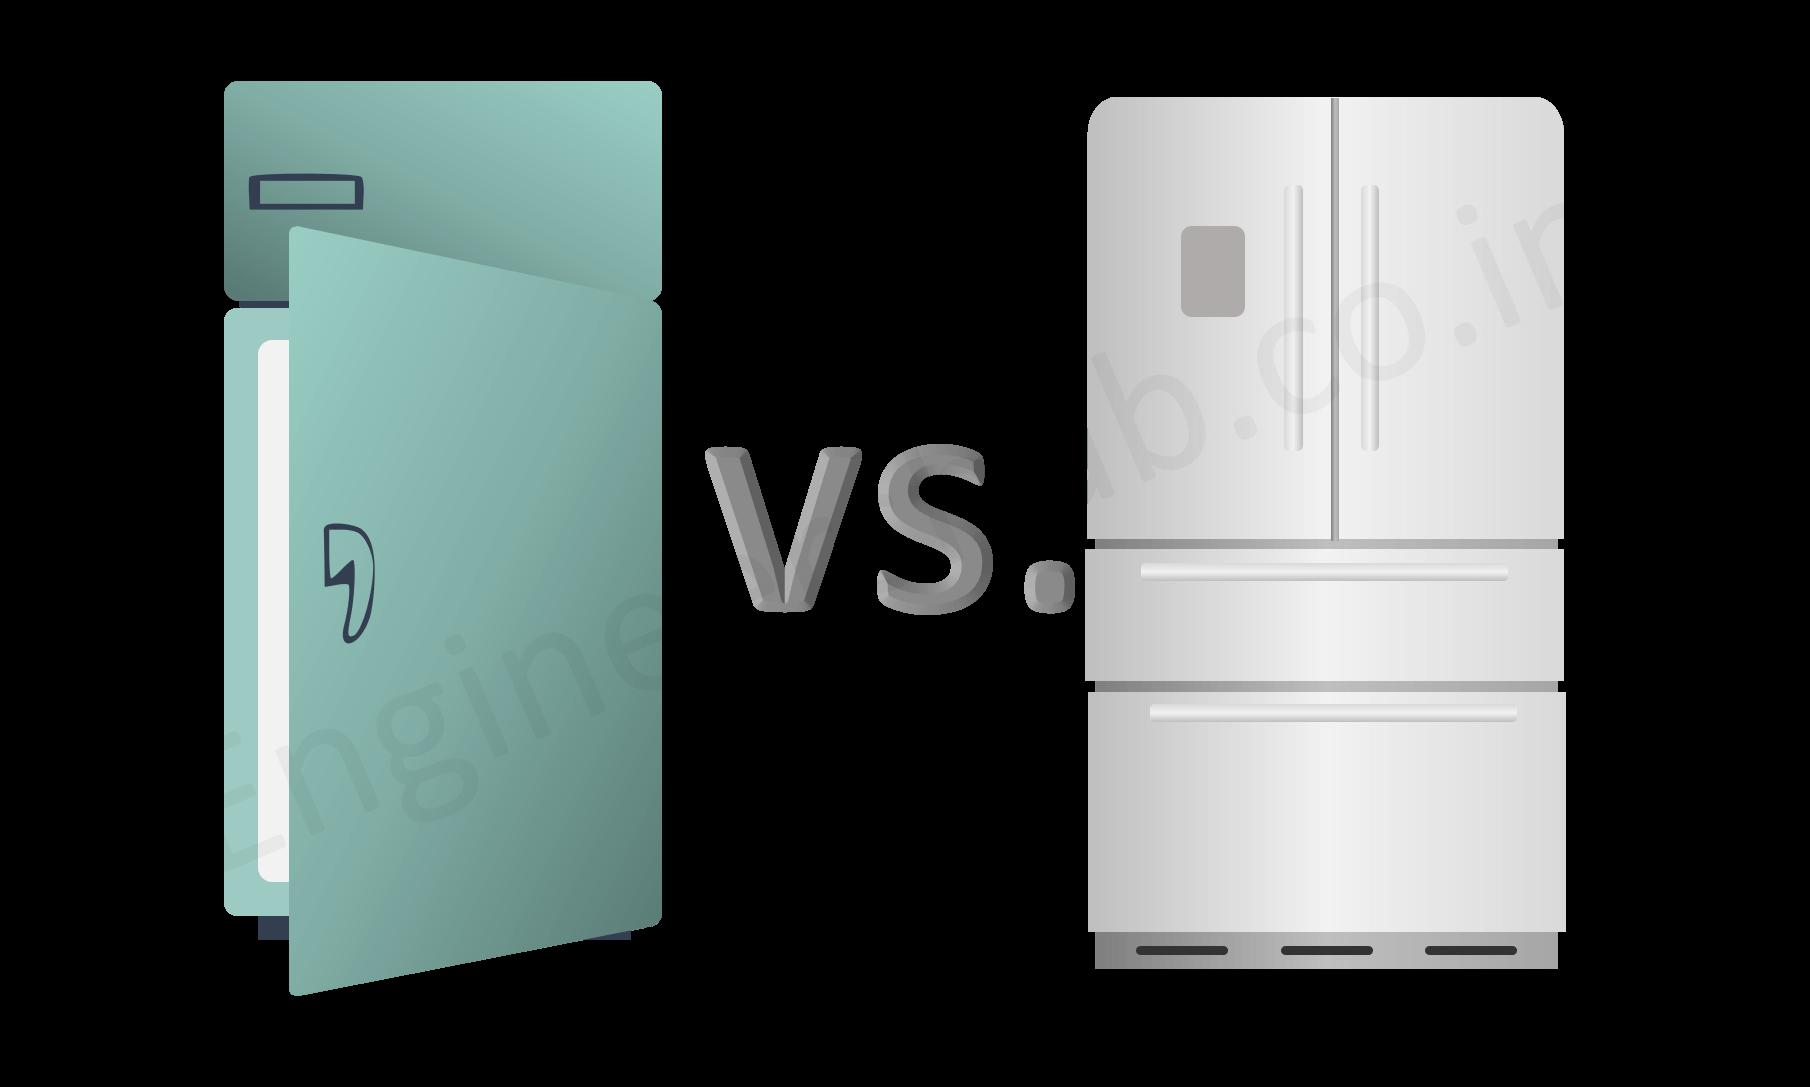 Old Refrigerator vs. new one